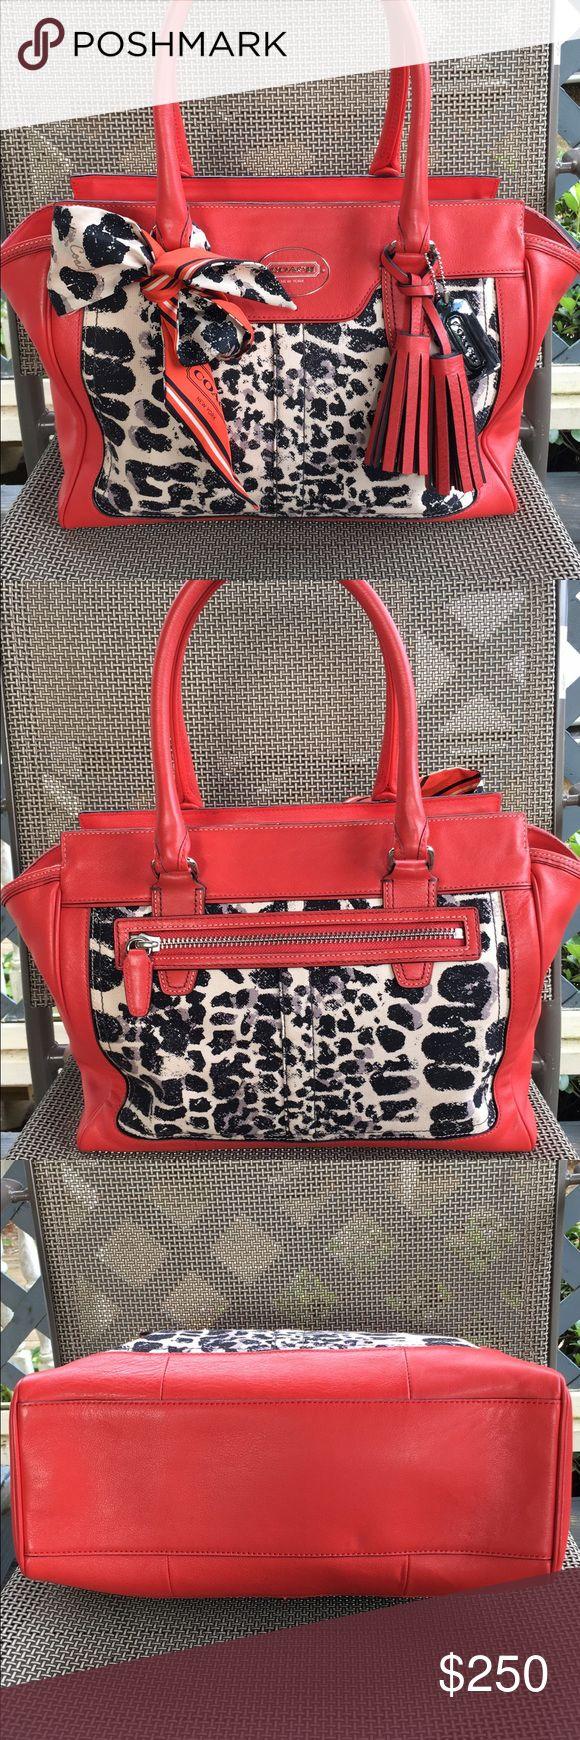 Coach Legacy Ocelot Handbag Pristine pre-owned condition Coach Bags Totes